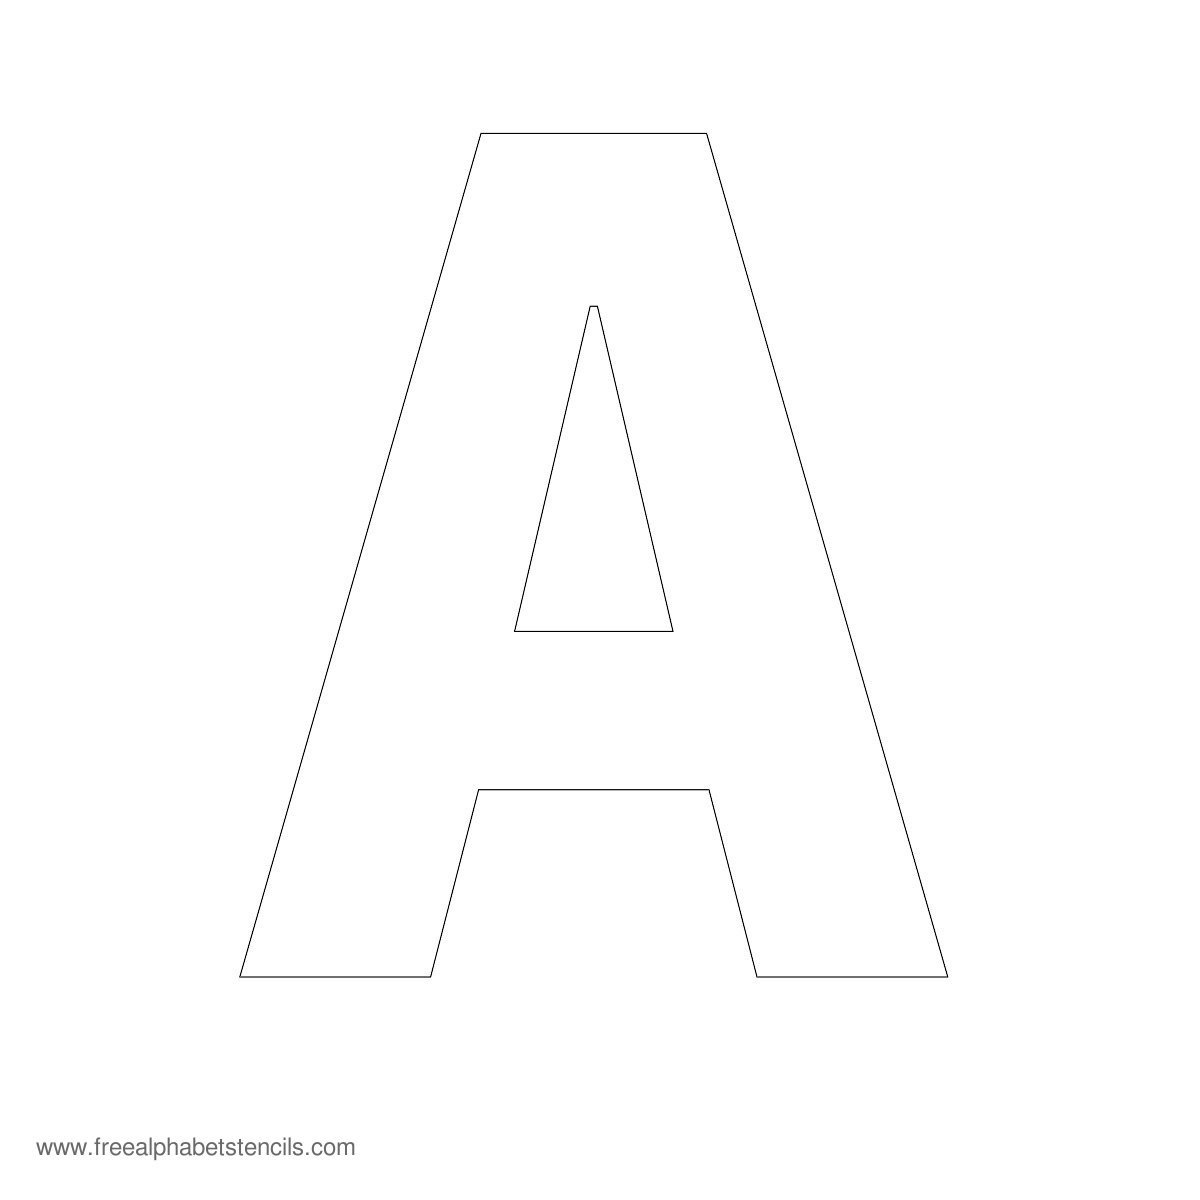 Large Alphabet Stencils | Freealphabetstencils - Online Letter Stencils Free Printable